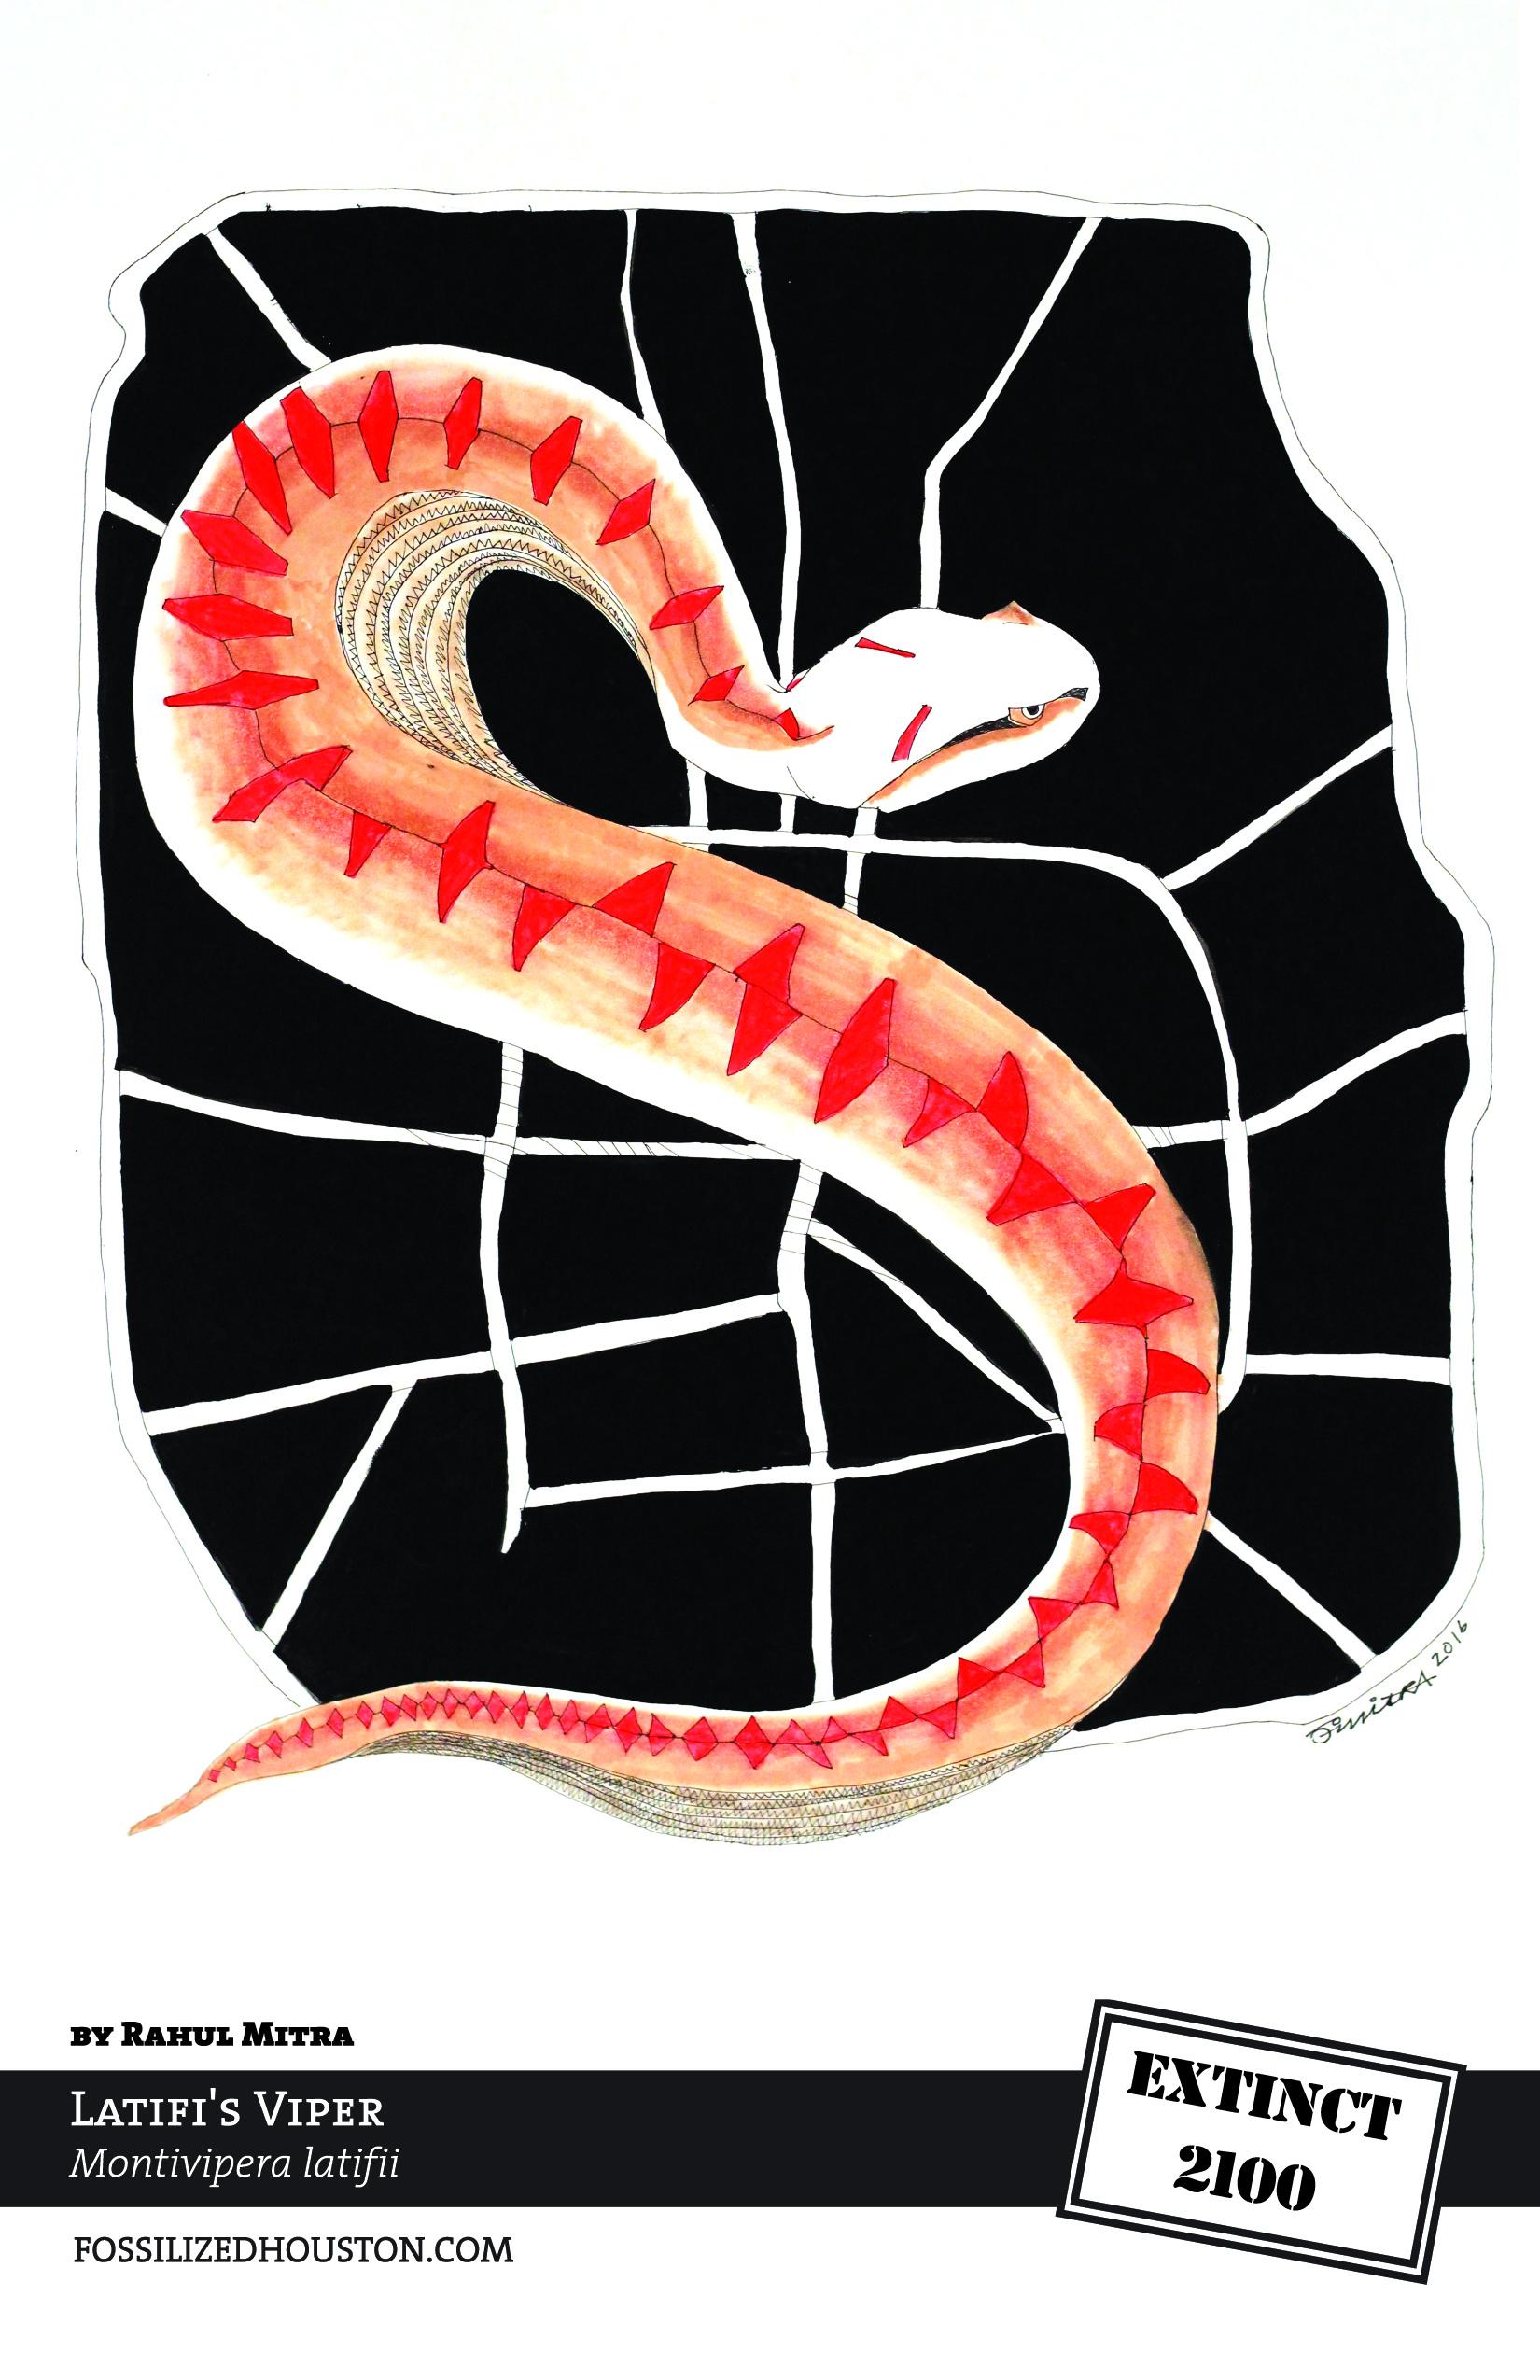 Latifi's Viper